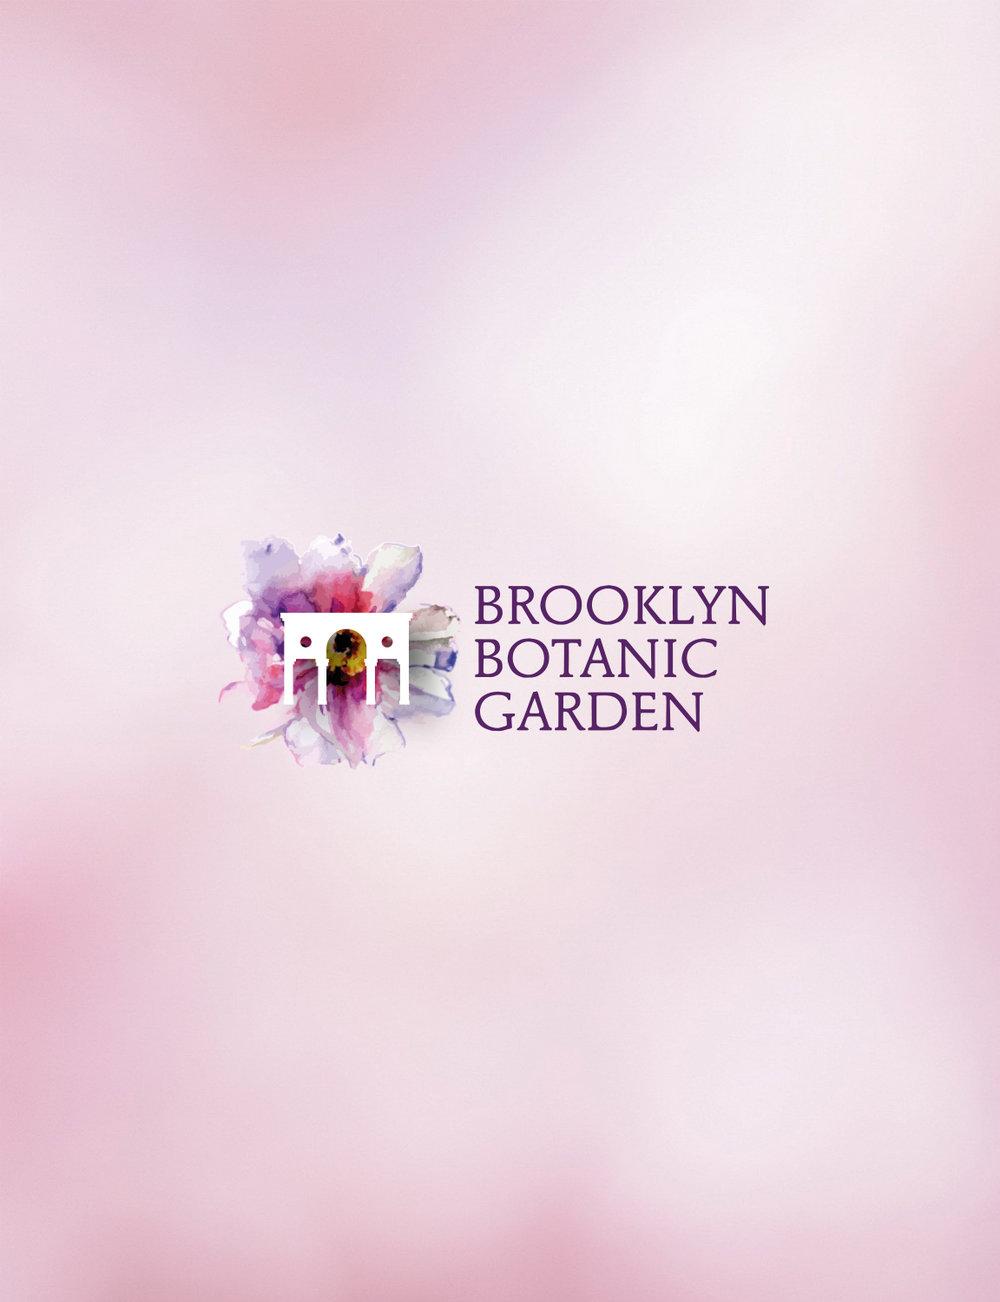 intro-bbg-branding-eleonora-majorana-brooklyn-botanic-garden.jpg